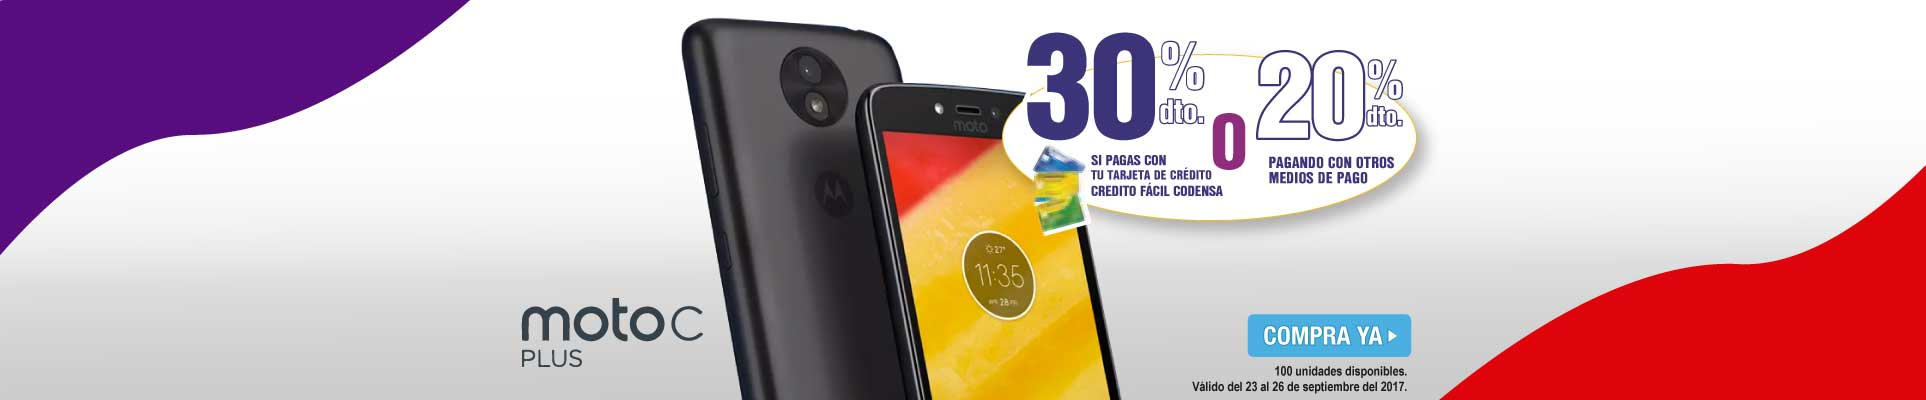 PPAL ALKP-6-celulares-Celular Libre Moto C Plus 4G-prod-septiembre23-26